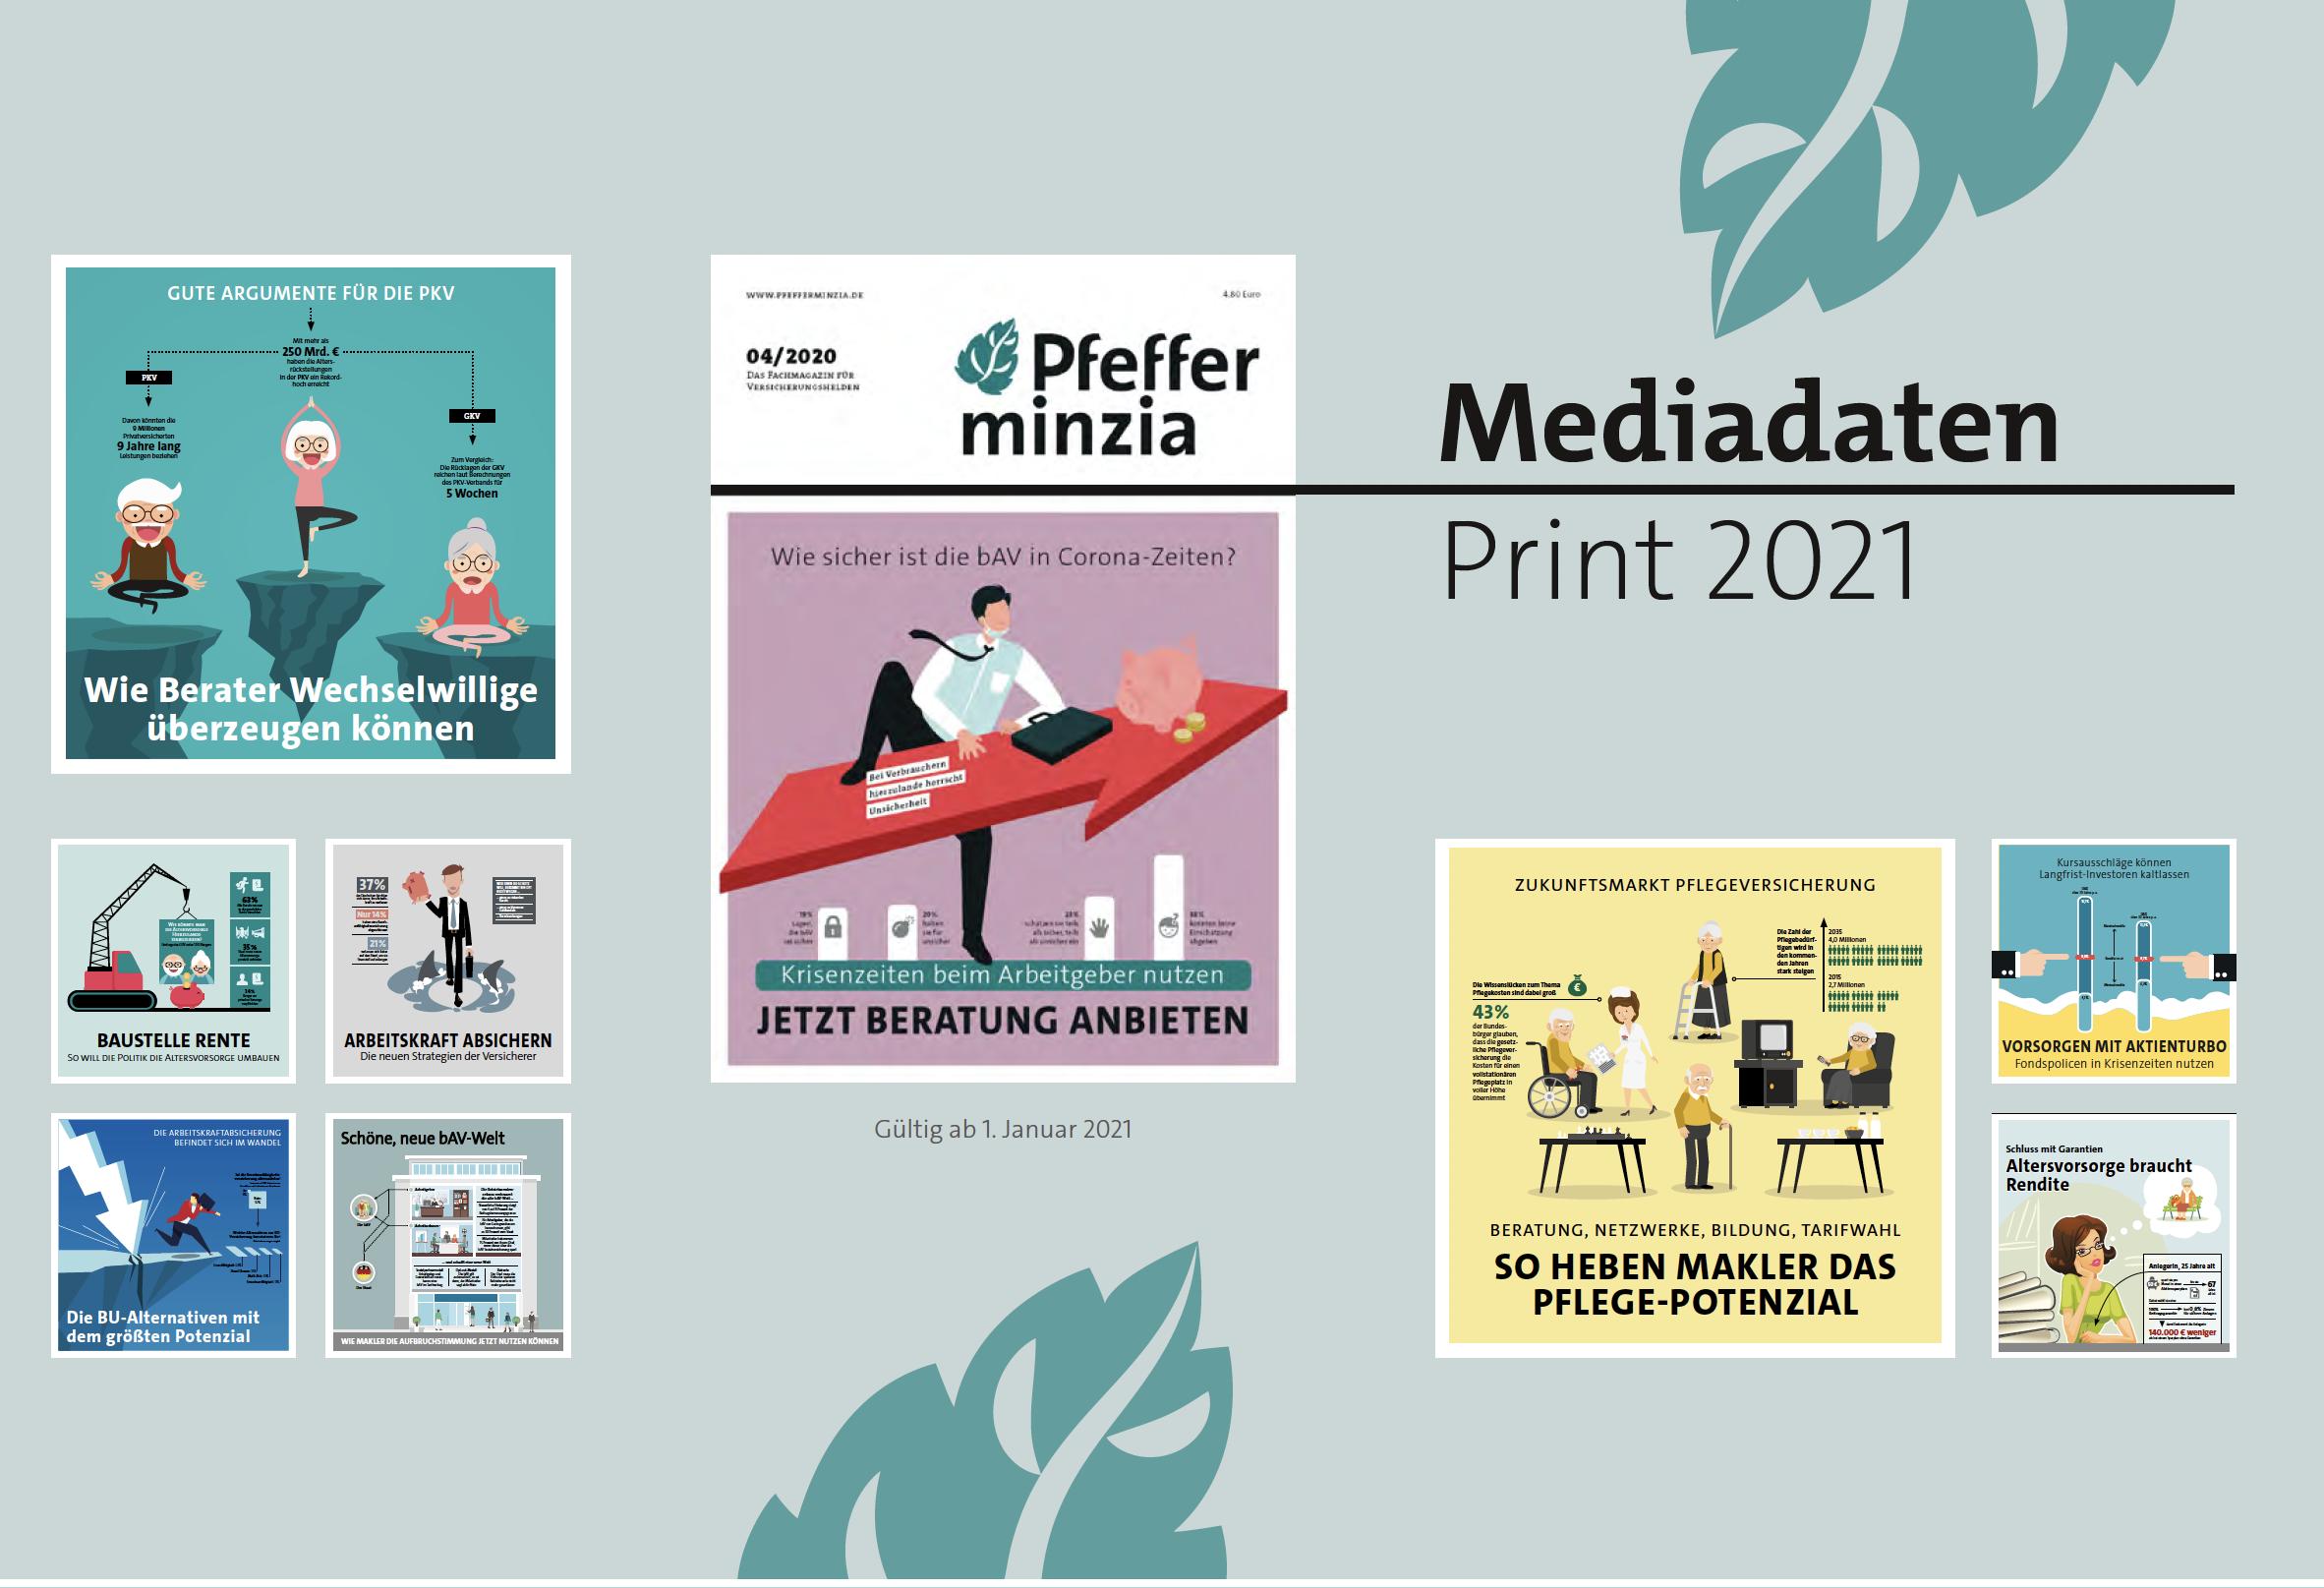 mediadaten-printmagazin